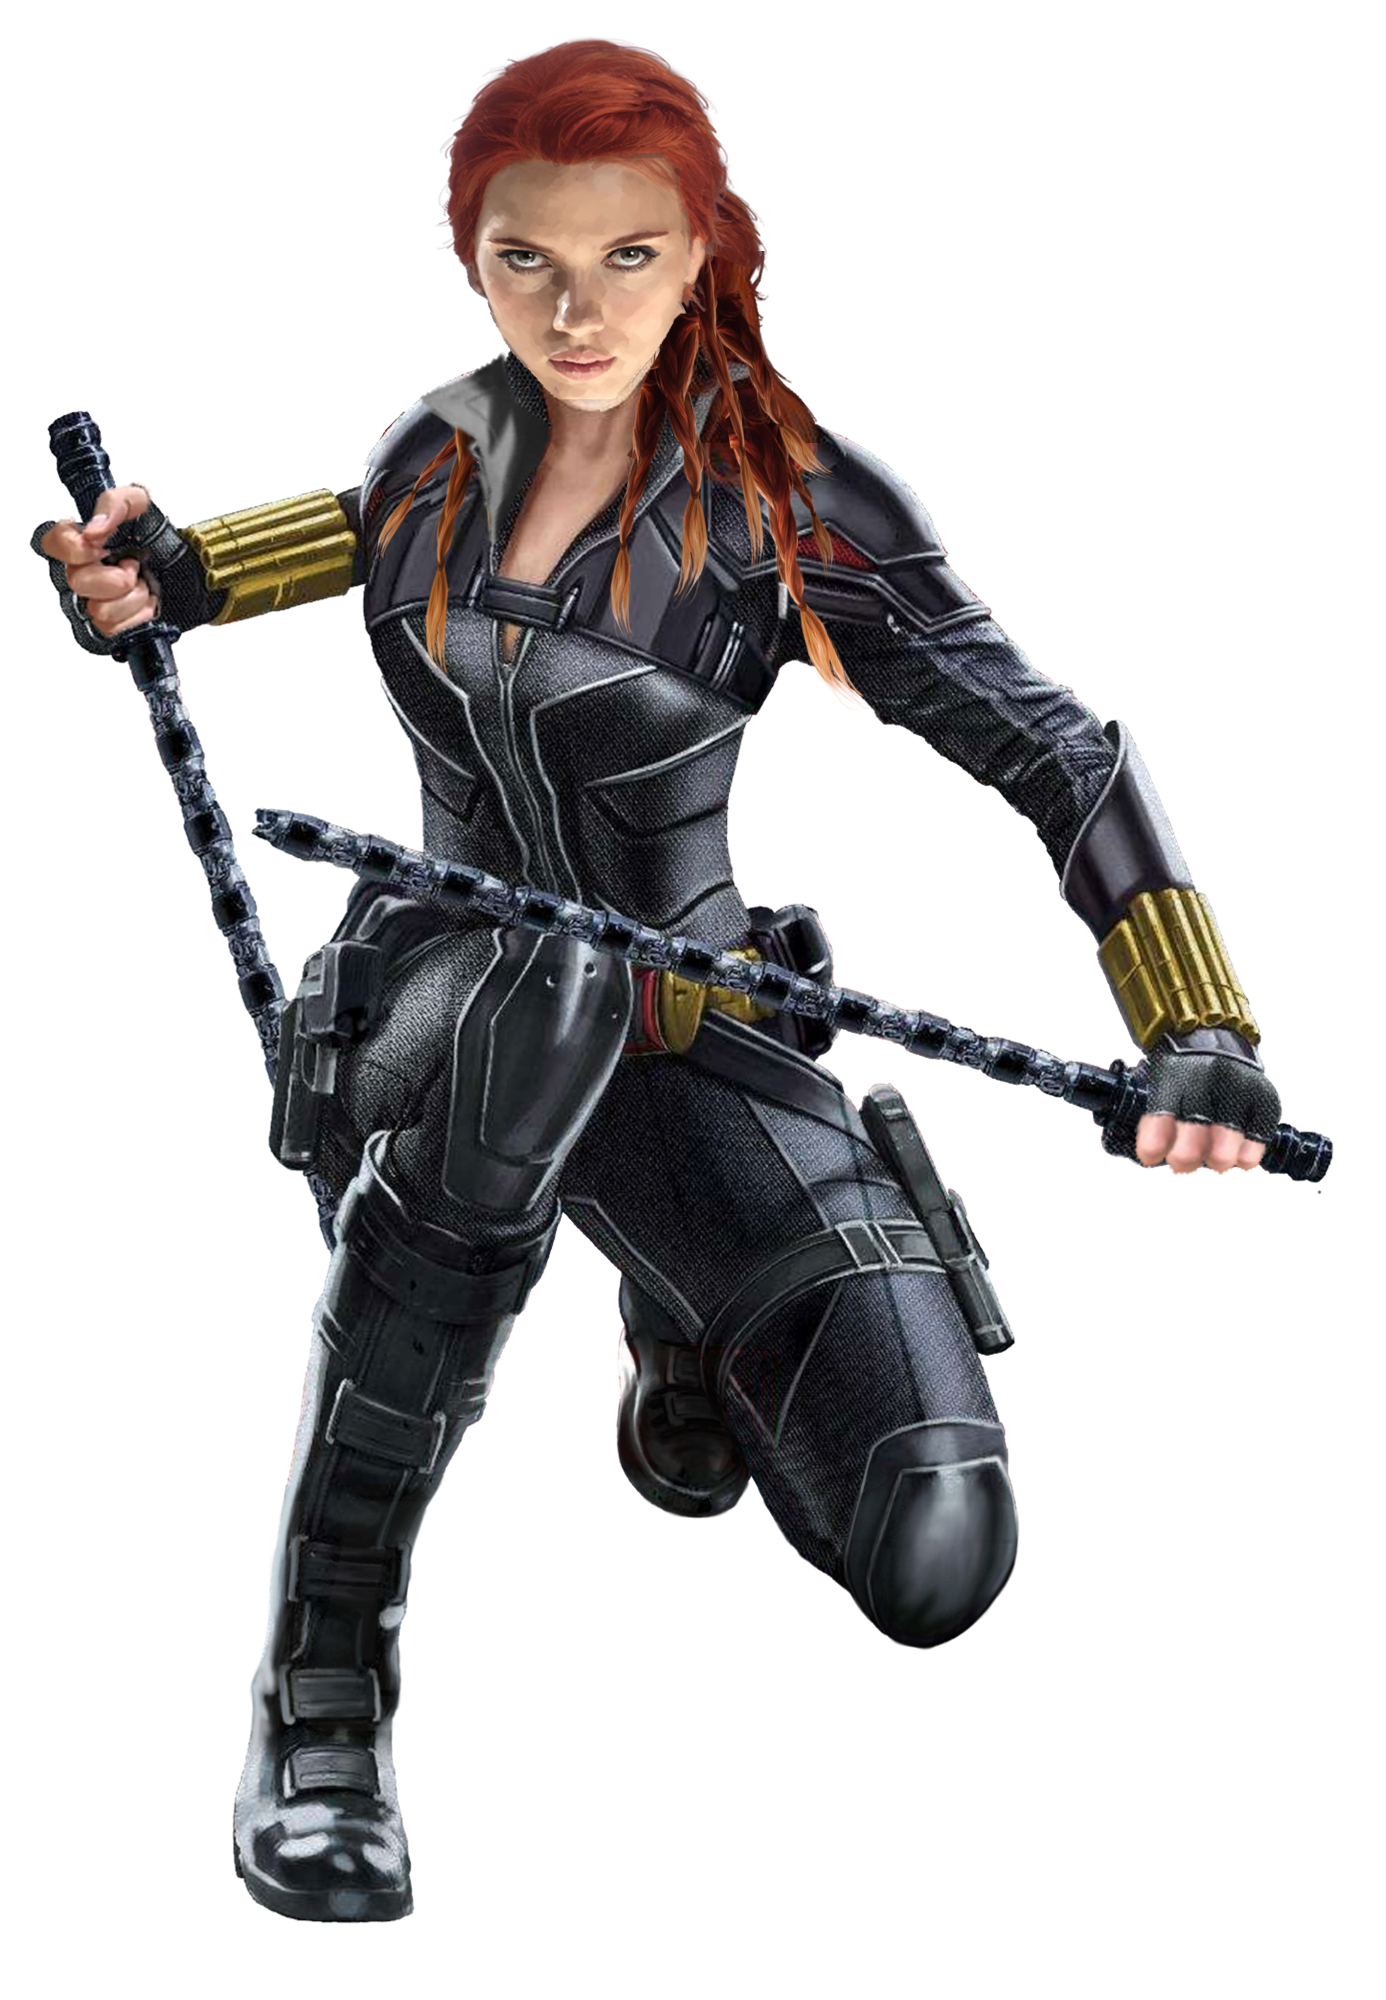 Black Widow 4 Movie Png By Captain Kingsman16 On Deviantart Black Widow Marvel Hollywood Walk Of Fame Widow